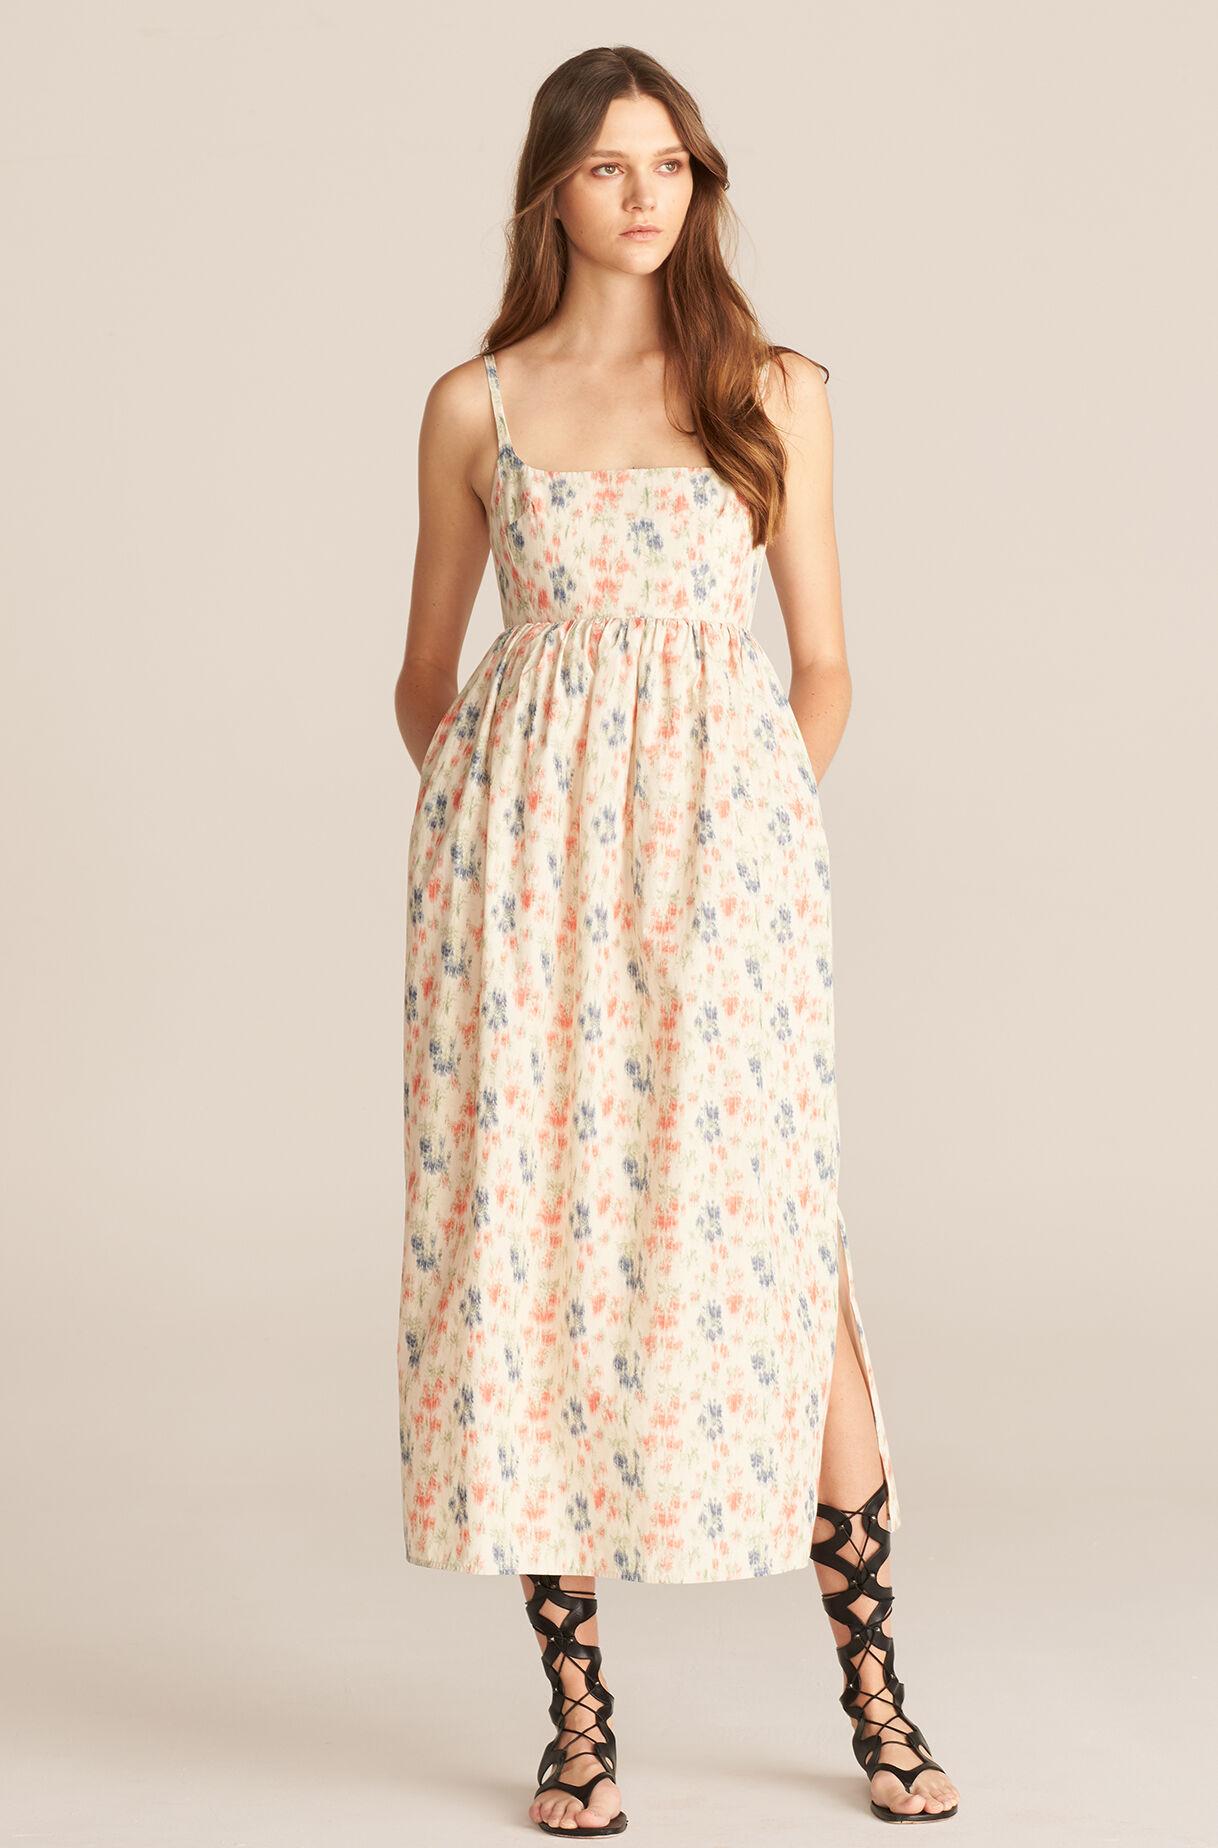 spring wedding guest dress in warm tones